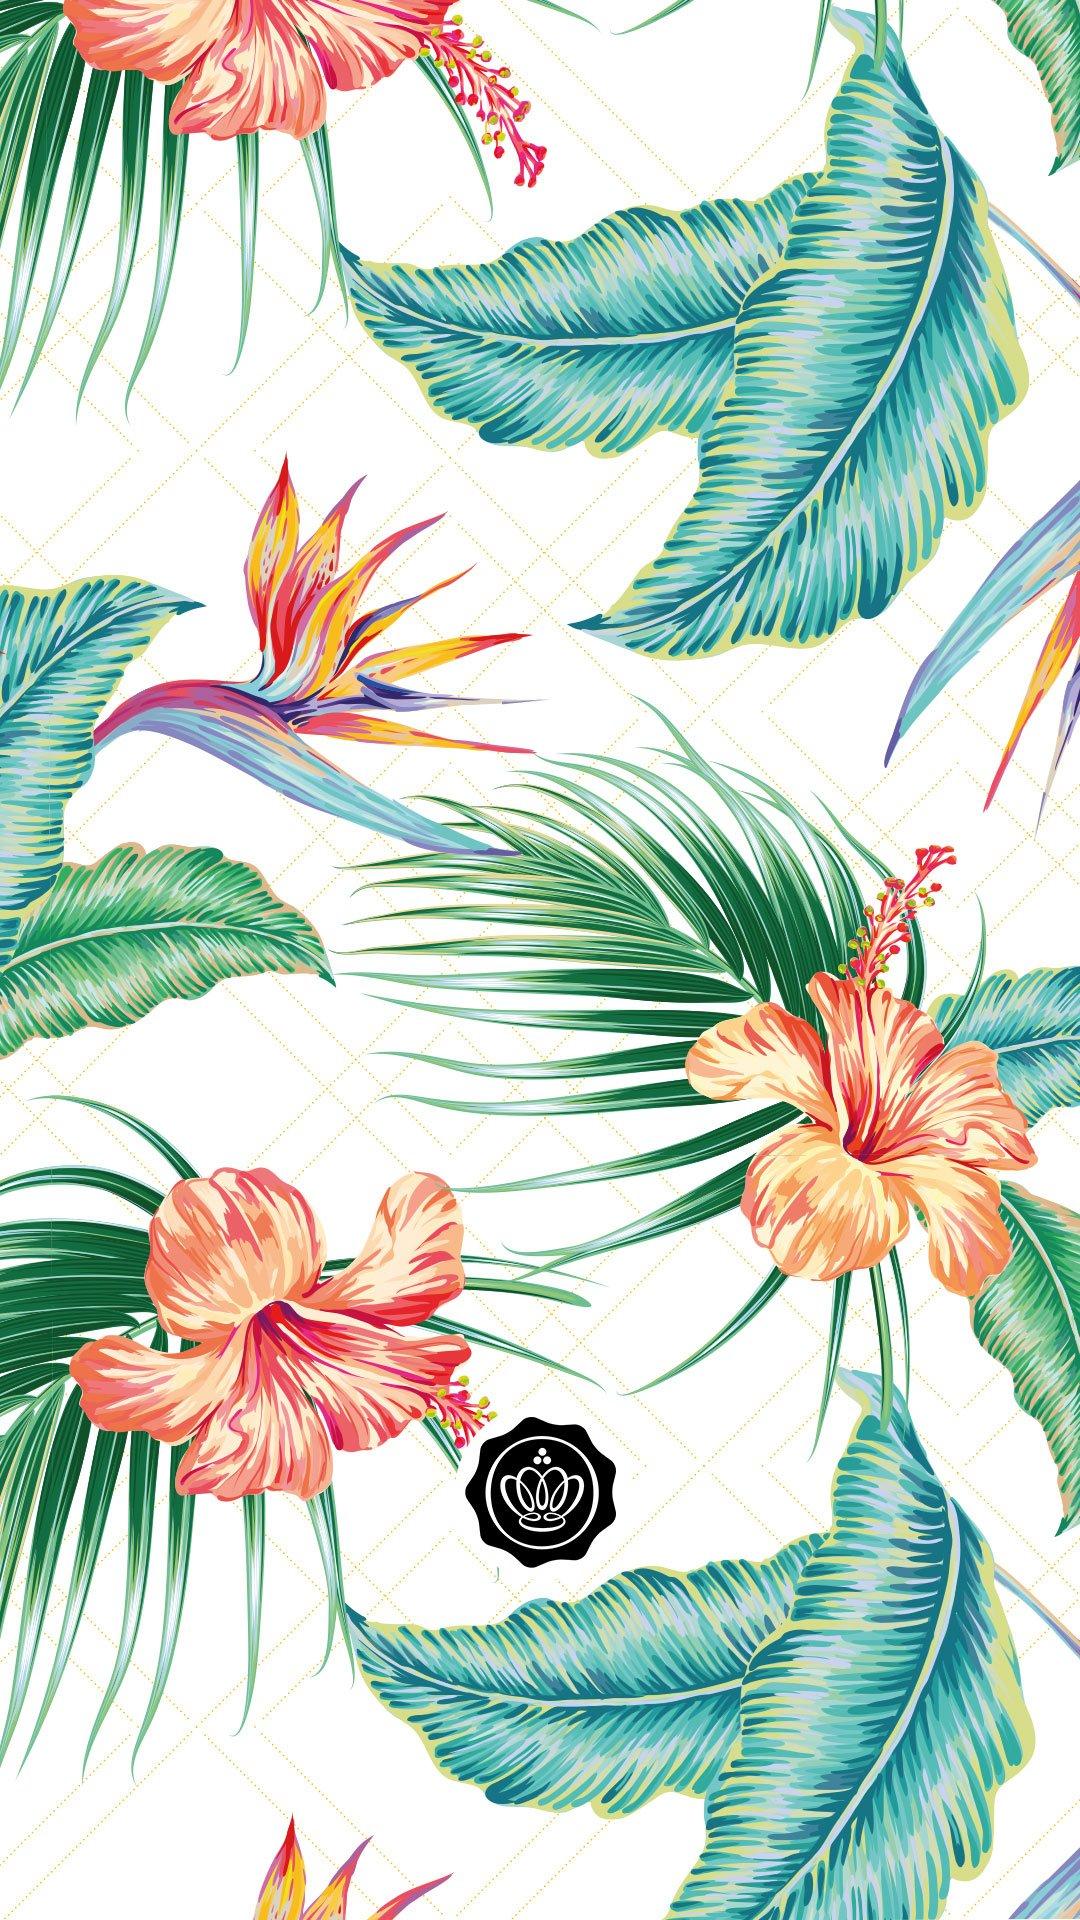 glossy-wallpaper-juli-2020-aloha-glossybox-screensaver